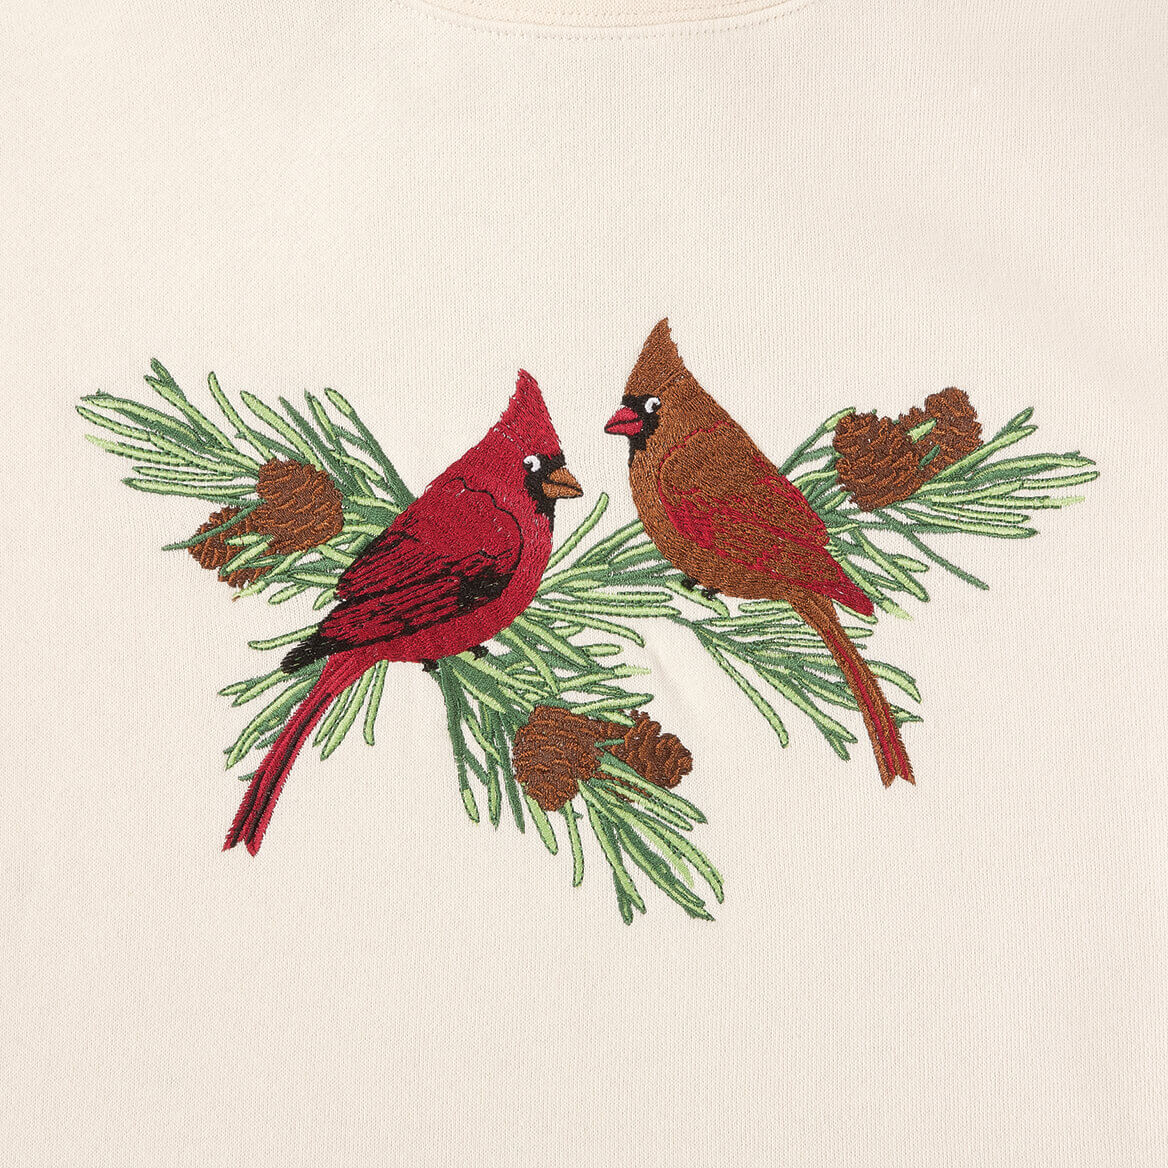 Cardinals on Pine Branch Sweatshirt by Sawyer Creek-360717